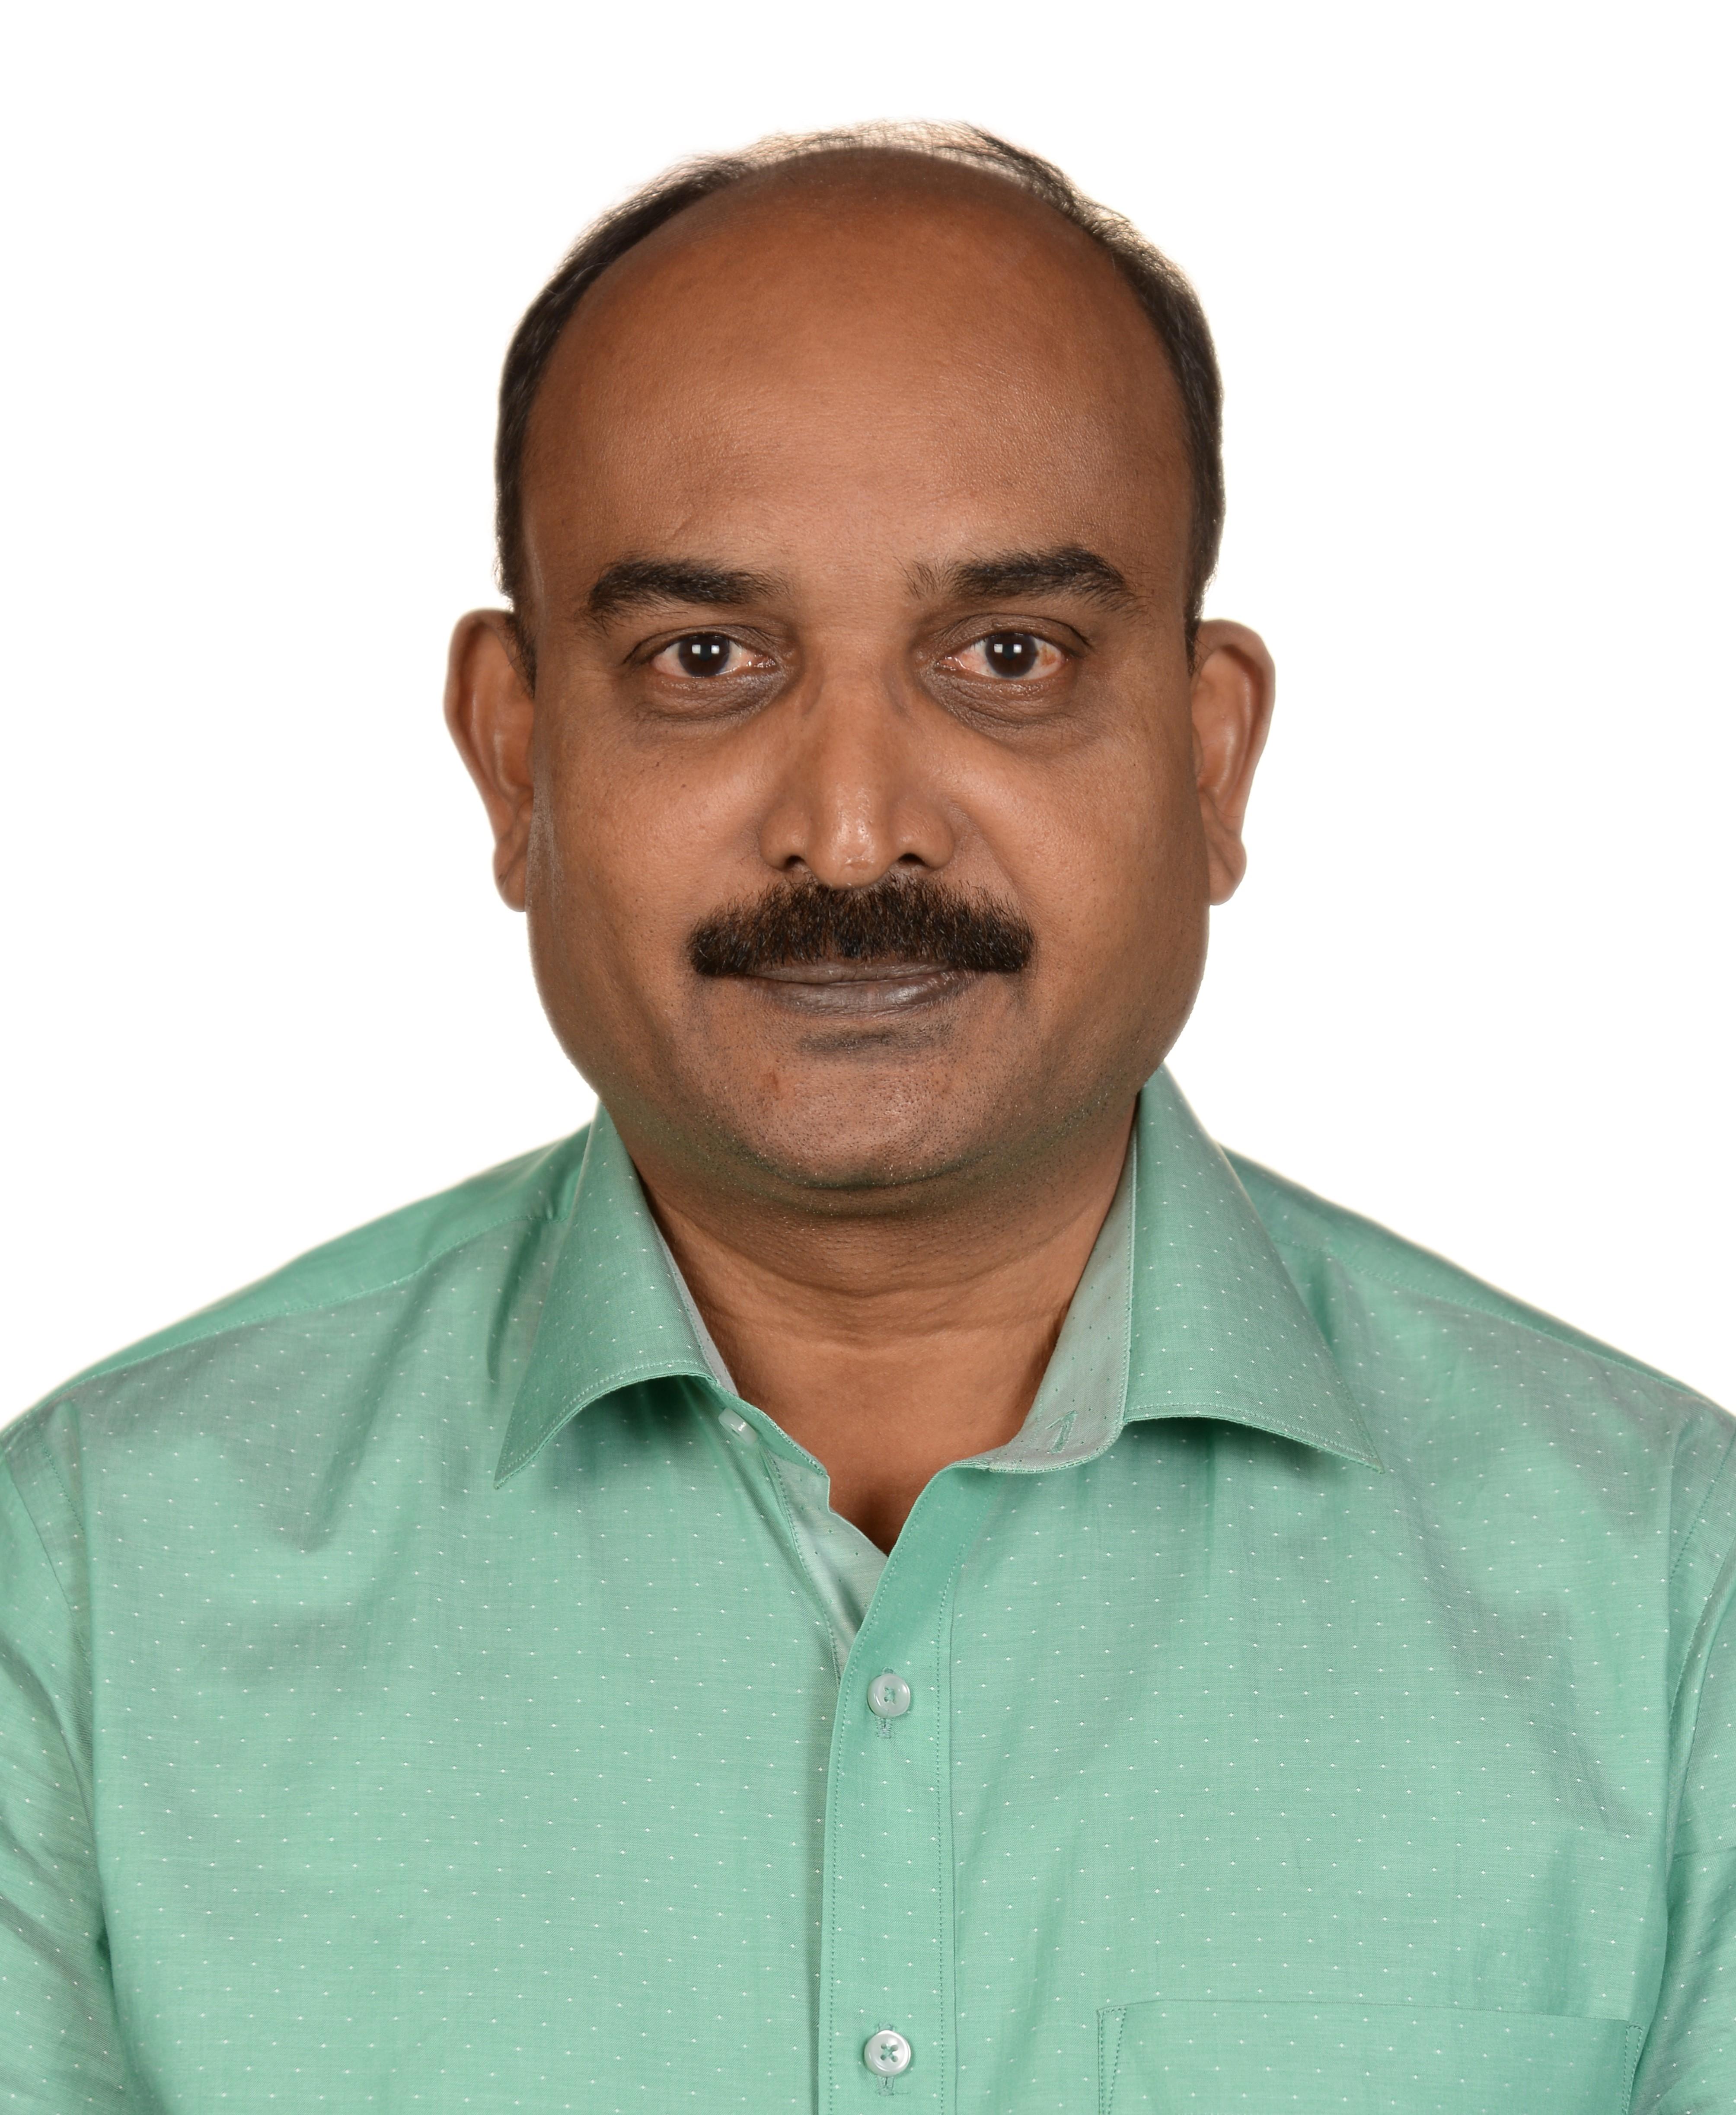 Christopher Samuel - PhD (Environmental Geochemistry) - Earth Sciences - Subject Matter Expert from Kolabtree